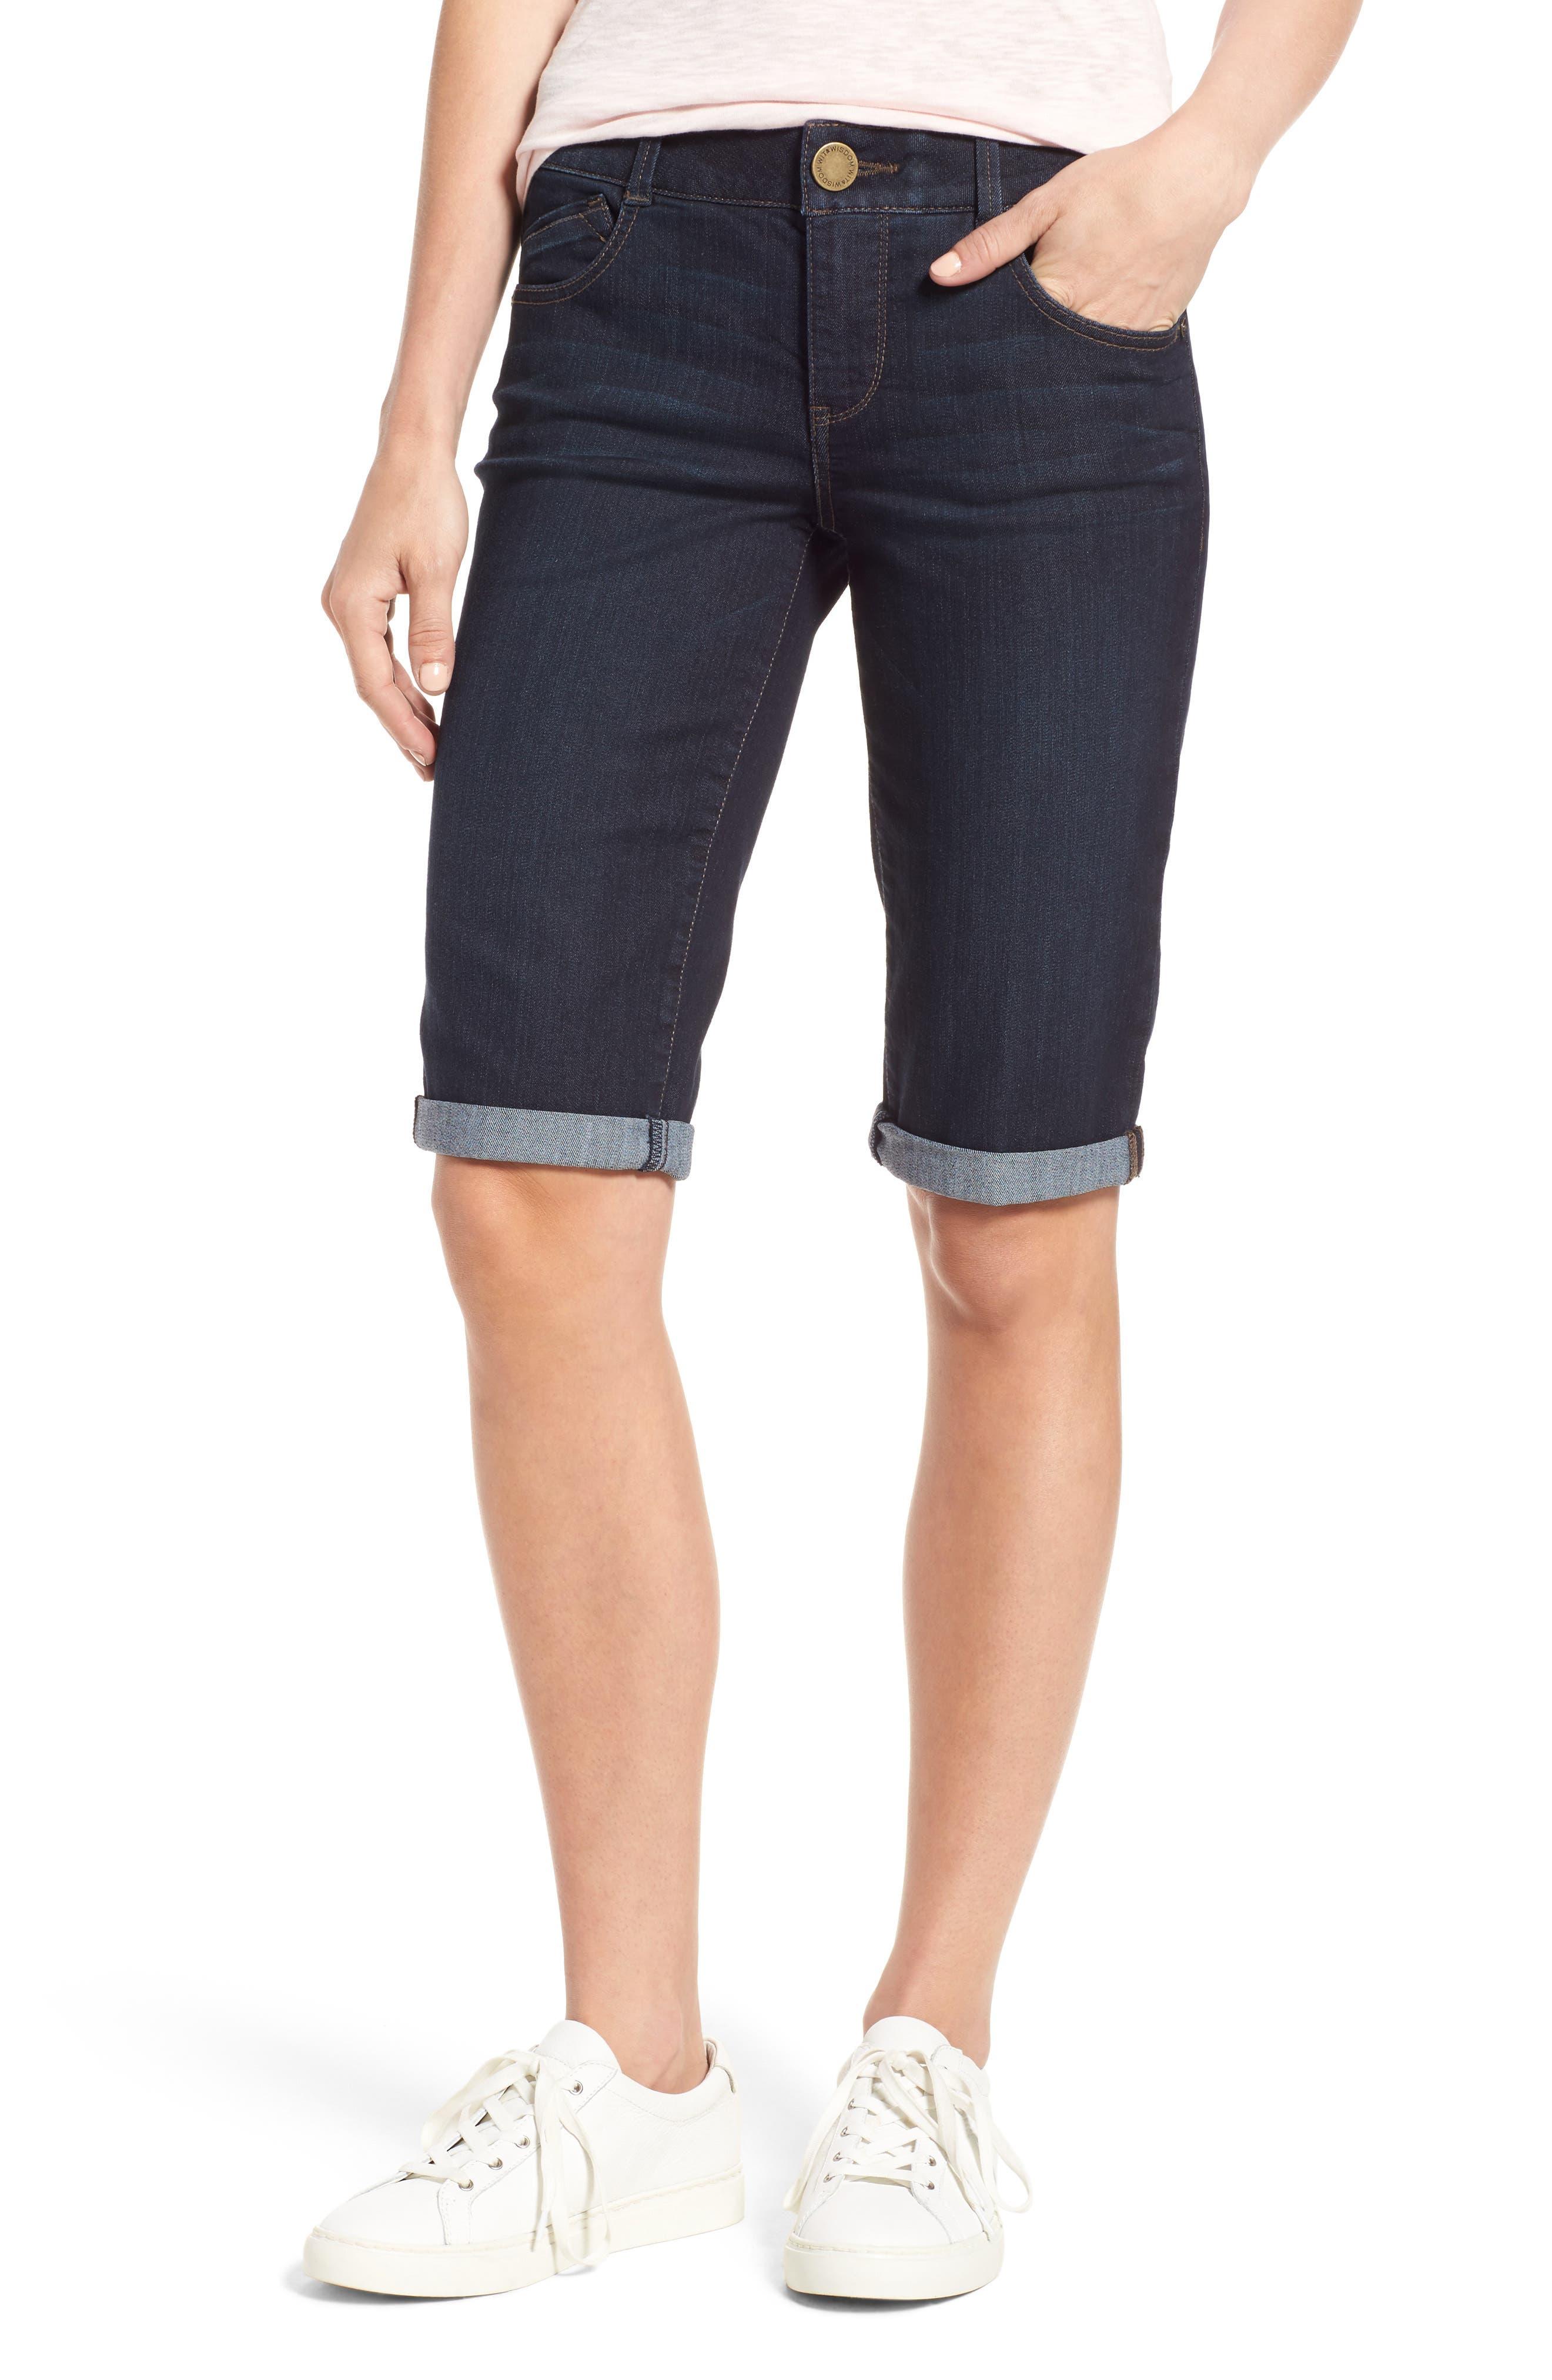 Alternate Image 1 Selected - Wit & Wisdom Ab-solution Denim Bermuda Shorts (Regular & Petite) (Nordstrom Exclusive)